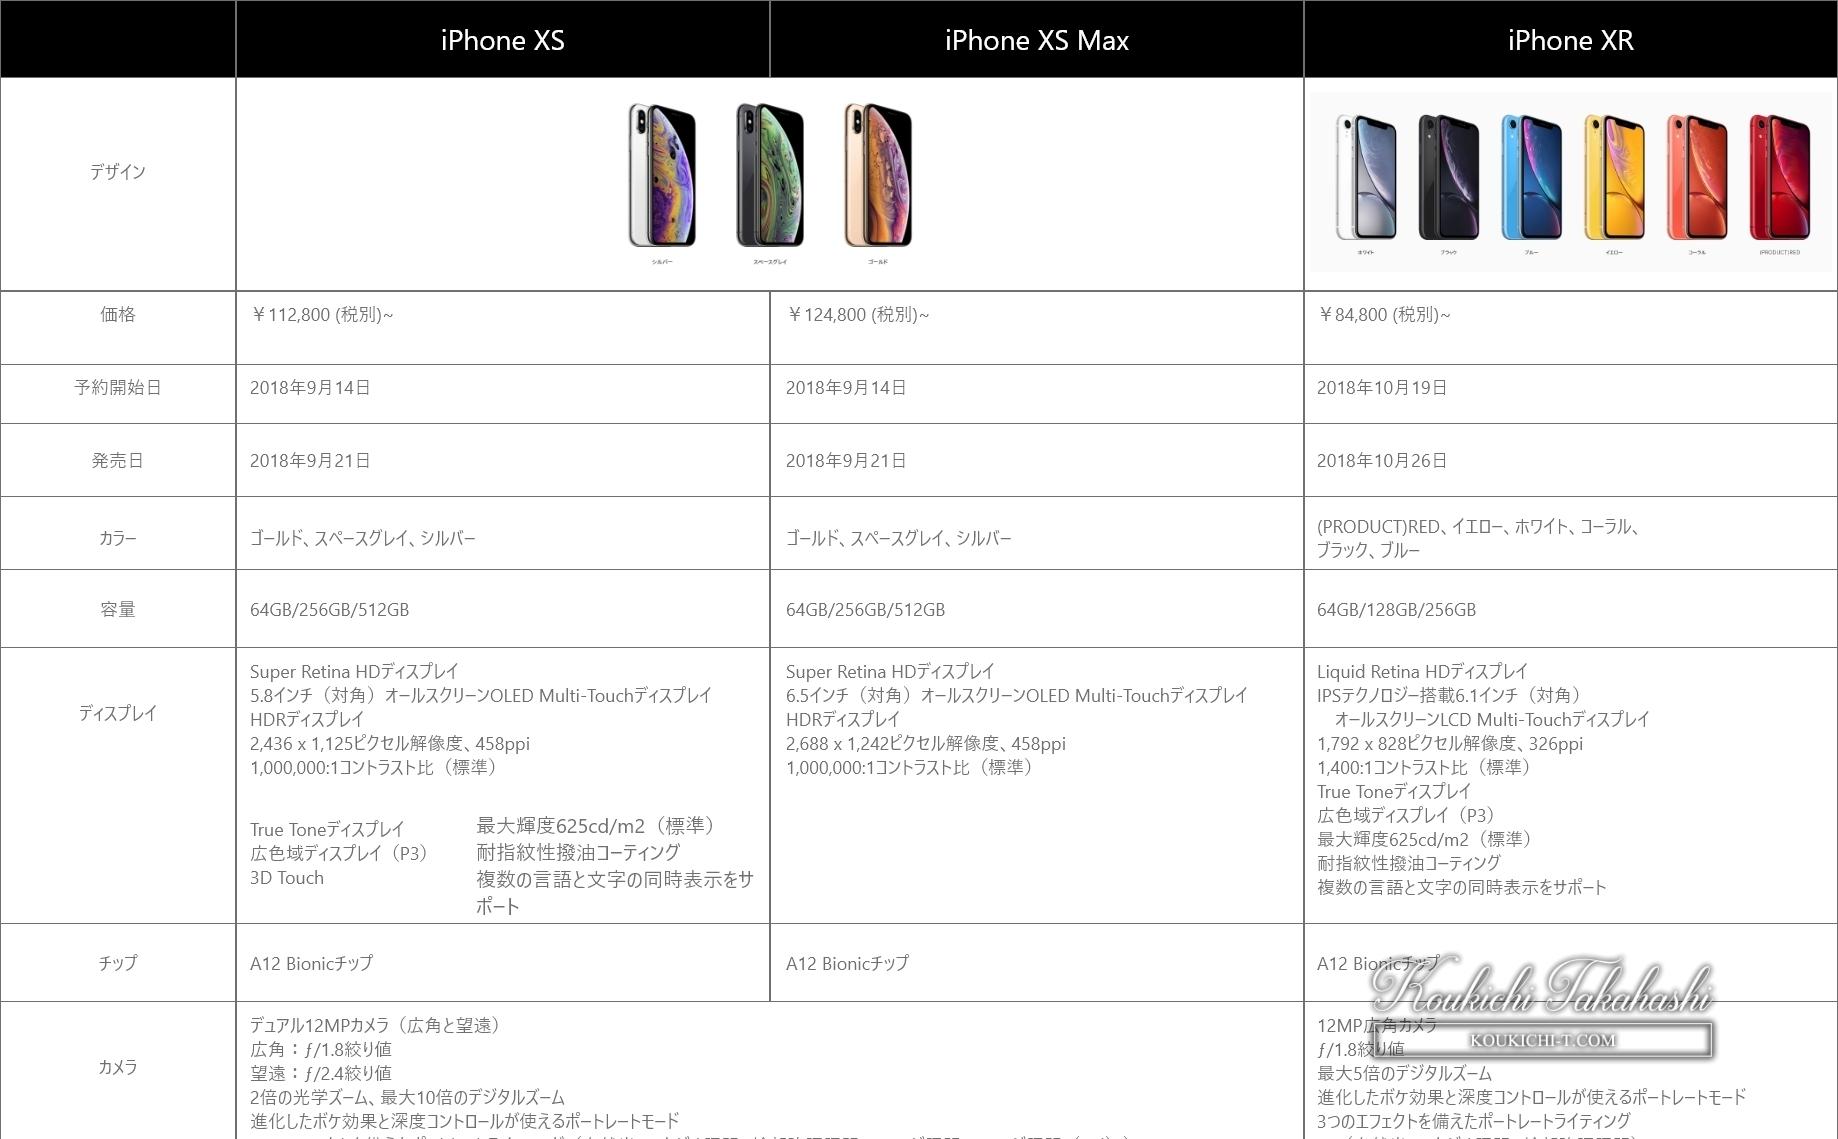 iPhone Xs iPhone Xs Max iPhone XR価格、予約開始日、発売日、カラー、カメラ、ビデオ性能比較まとめ。 !Apple新製品発表会新型iPhoneアップル最新ニュース速報 2018.jpg